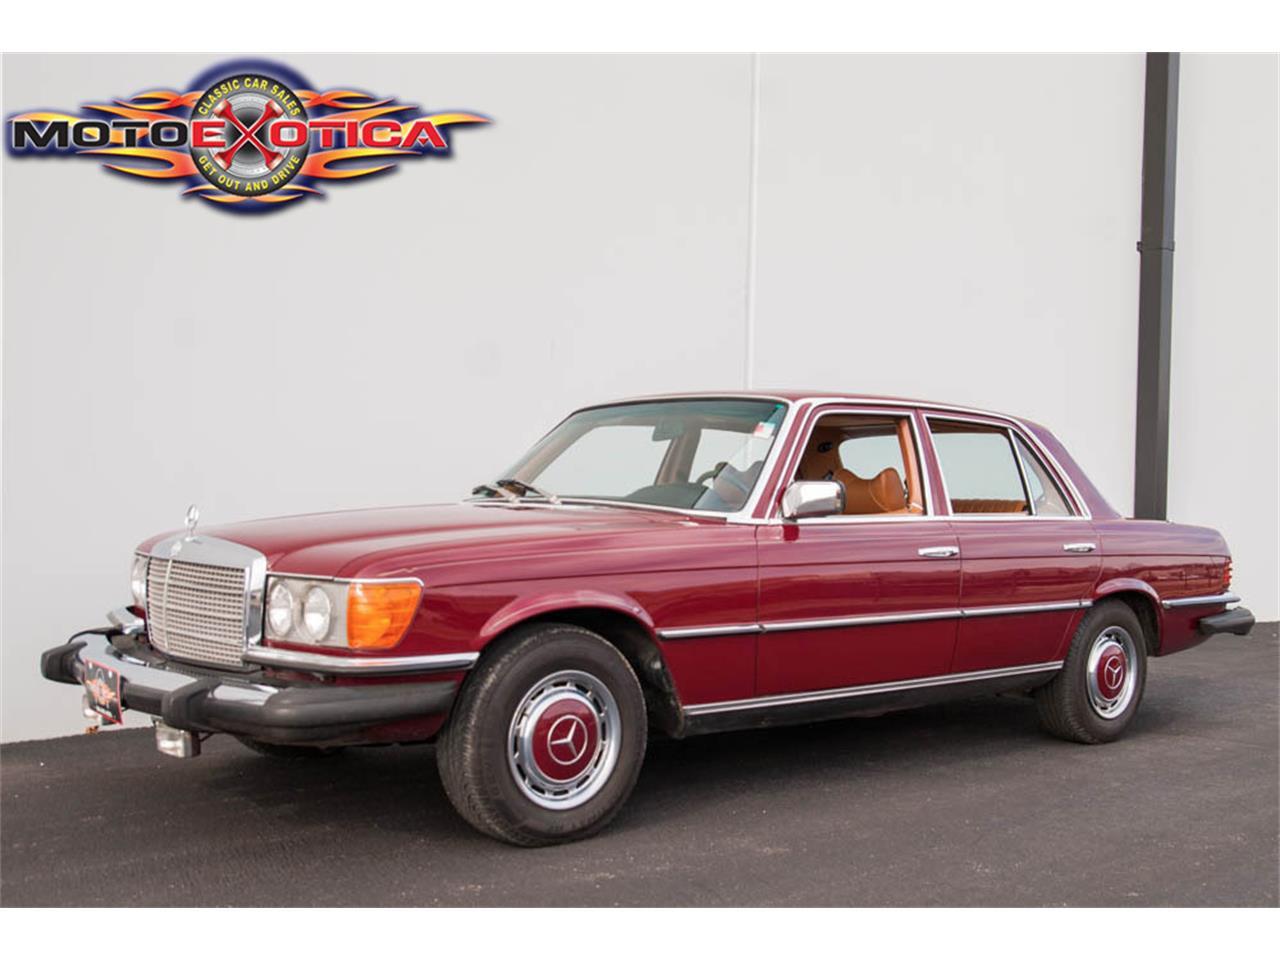 1976 mercedes benz 450 for sale cc 781738 for Mercedes benz st louis service